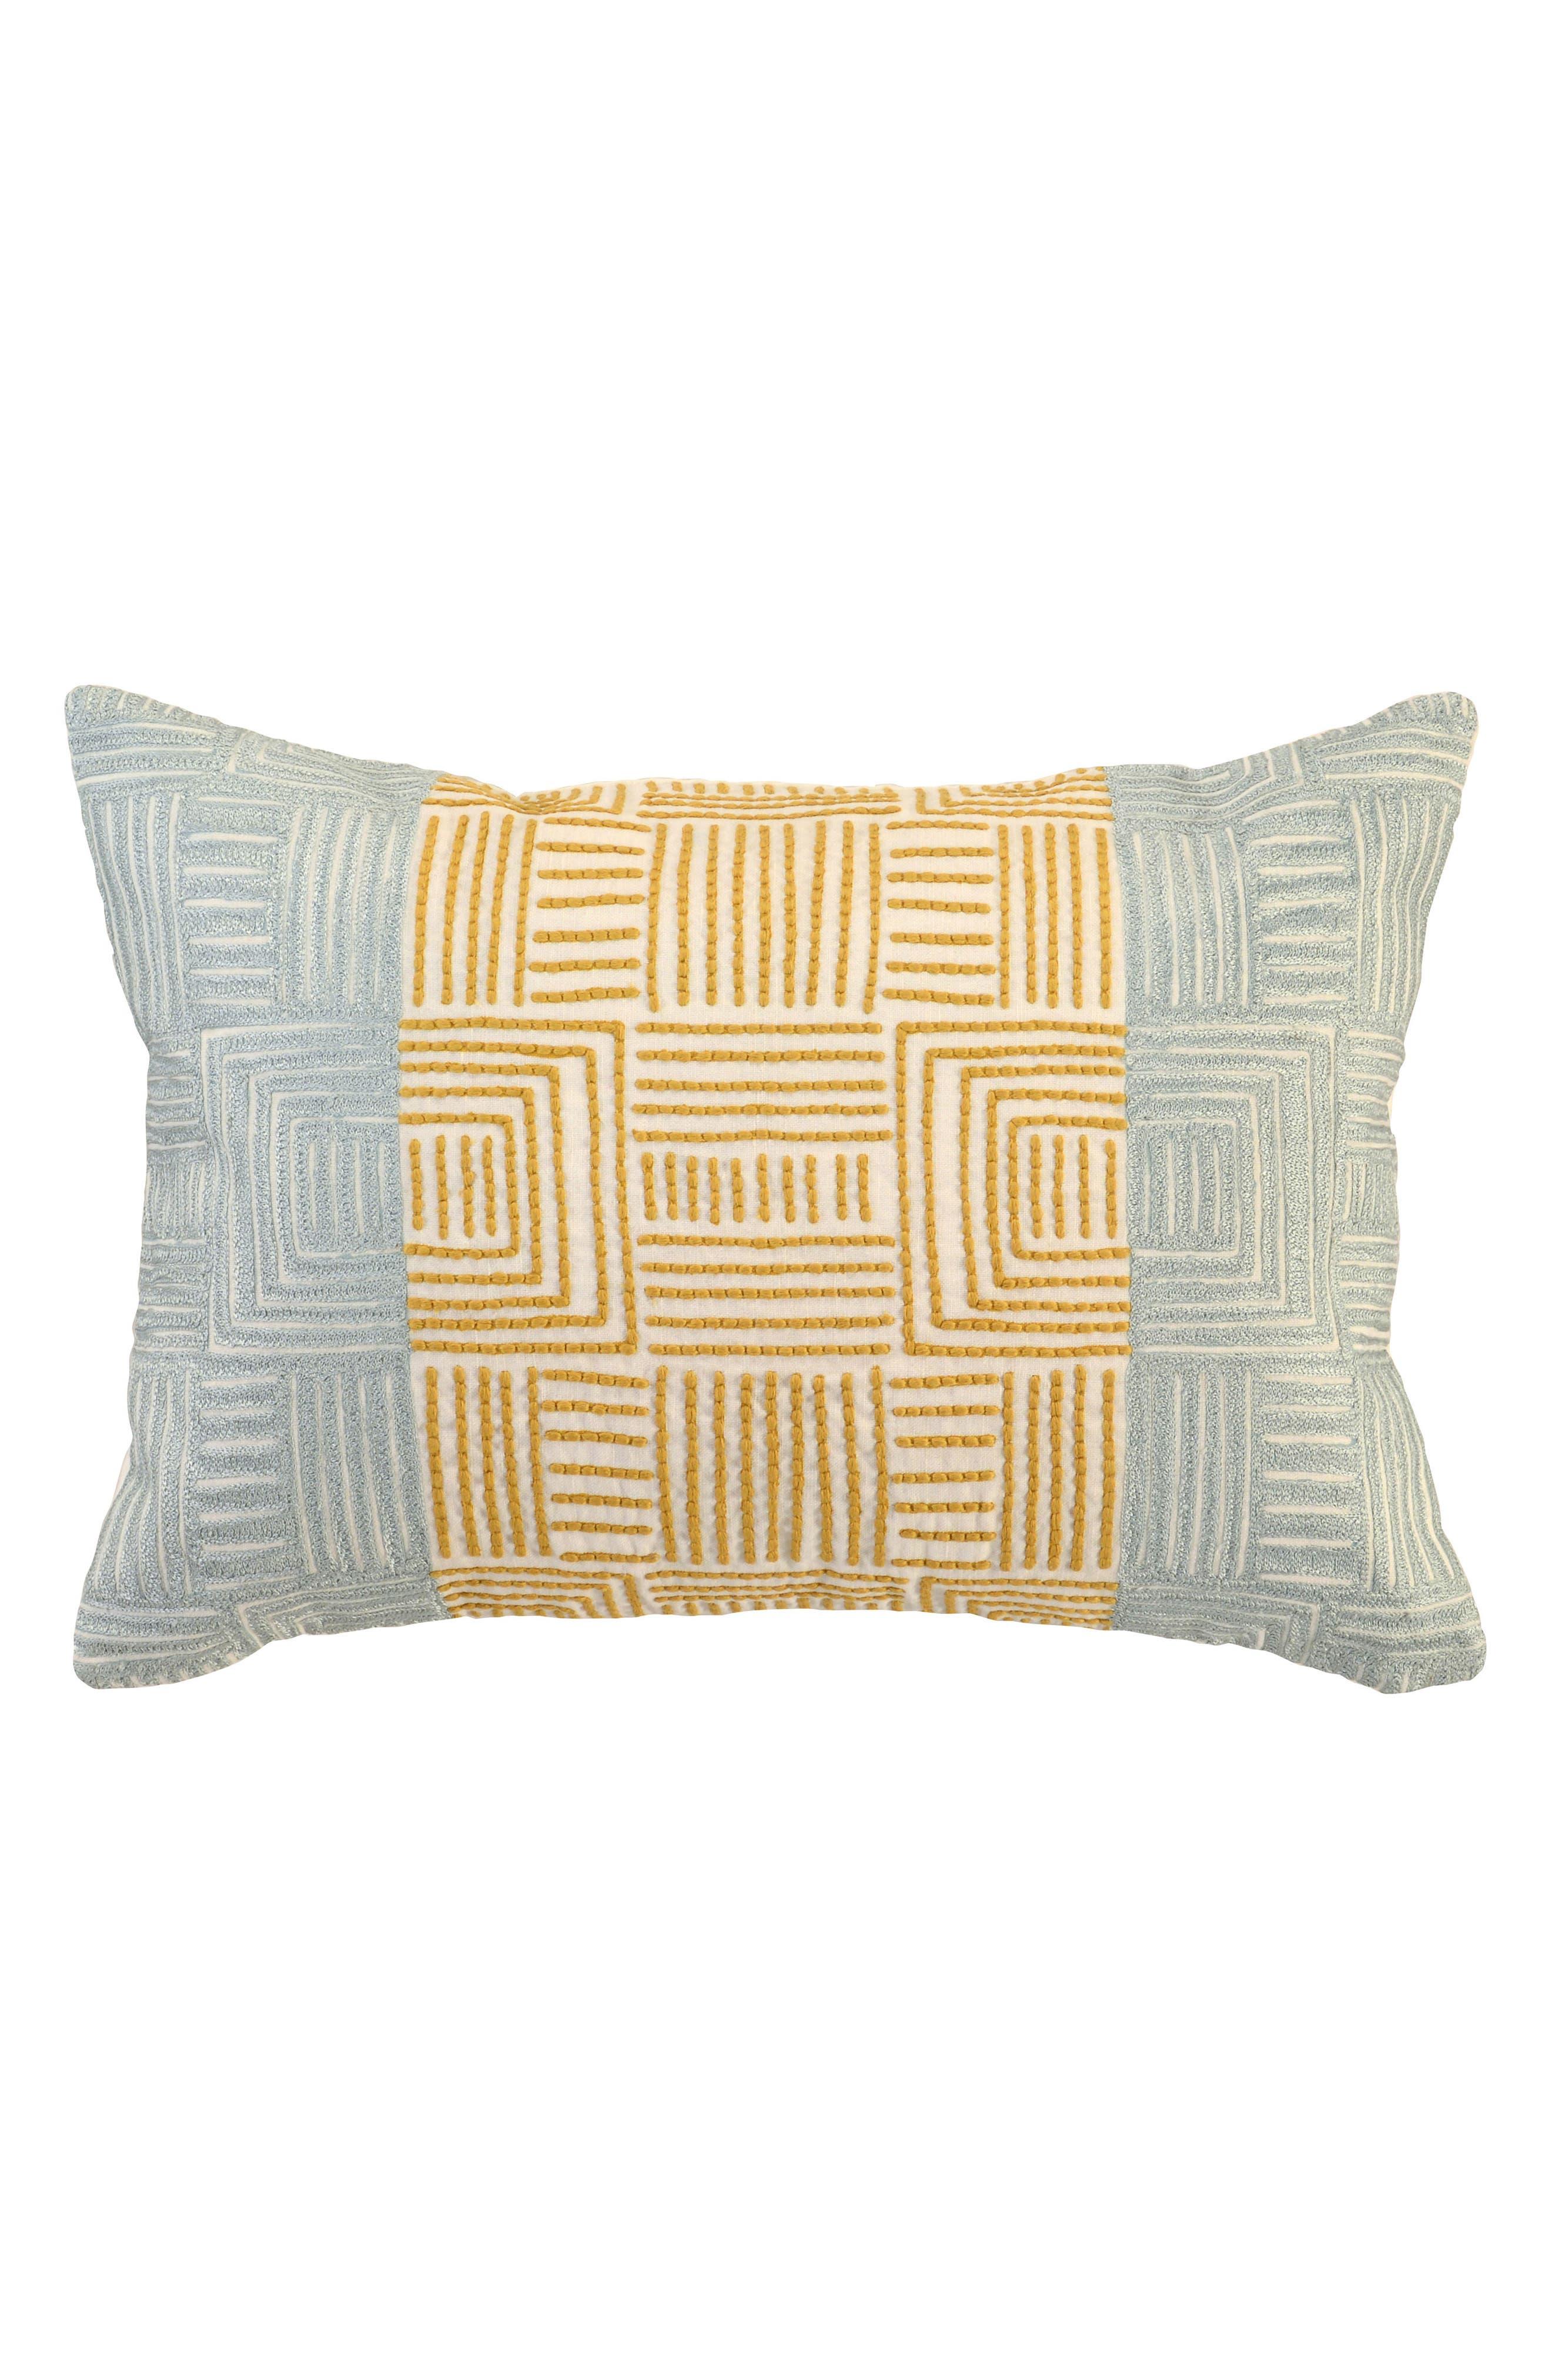 Dixon Ocre Tidal Accent Pillow,                             Main thumbnail 1, color,                             SEAGLASS/ YELLOW